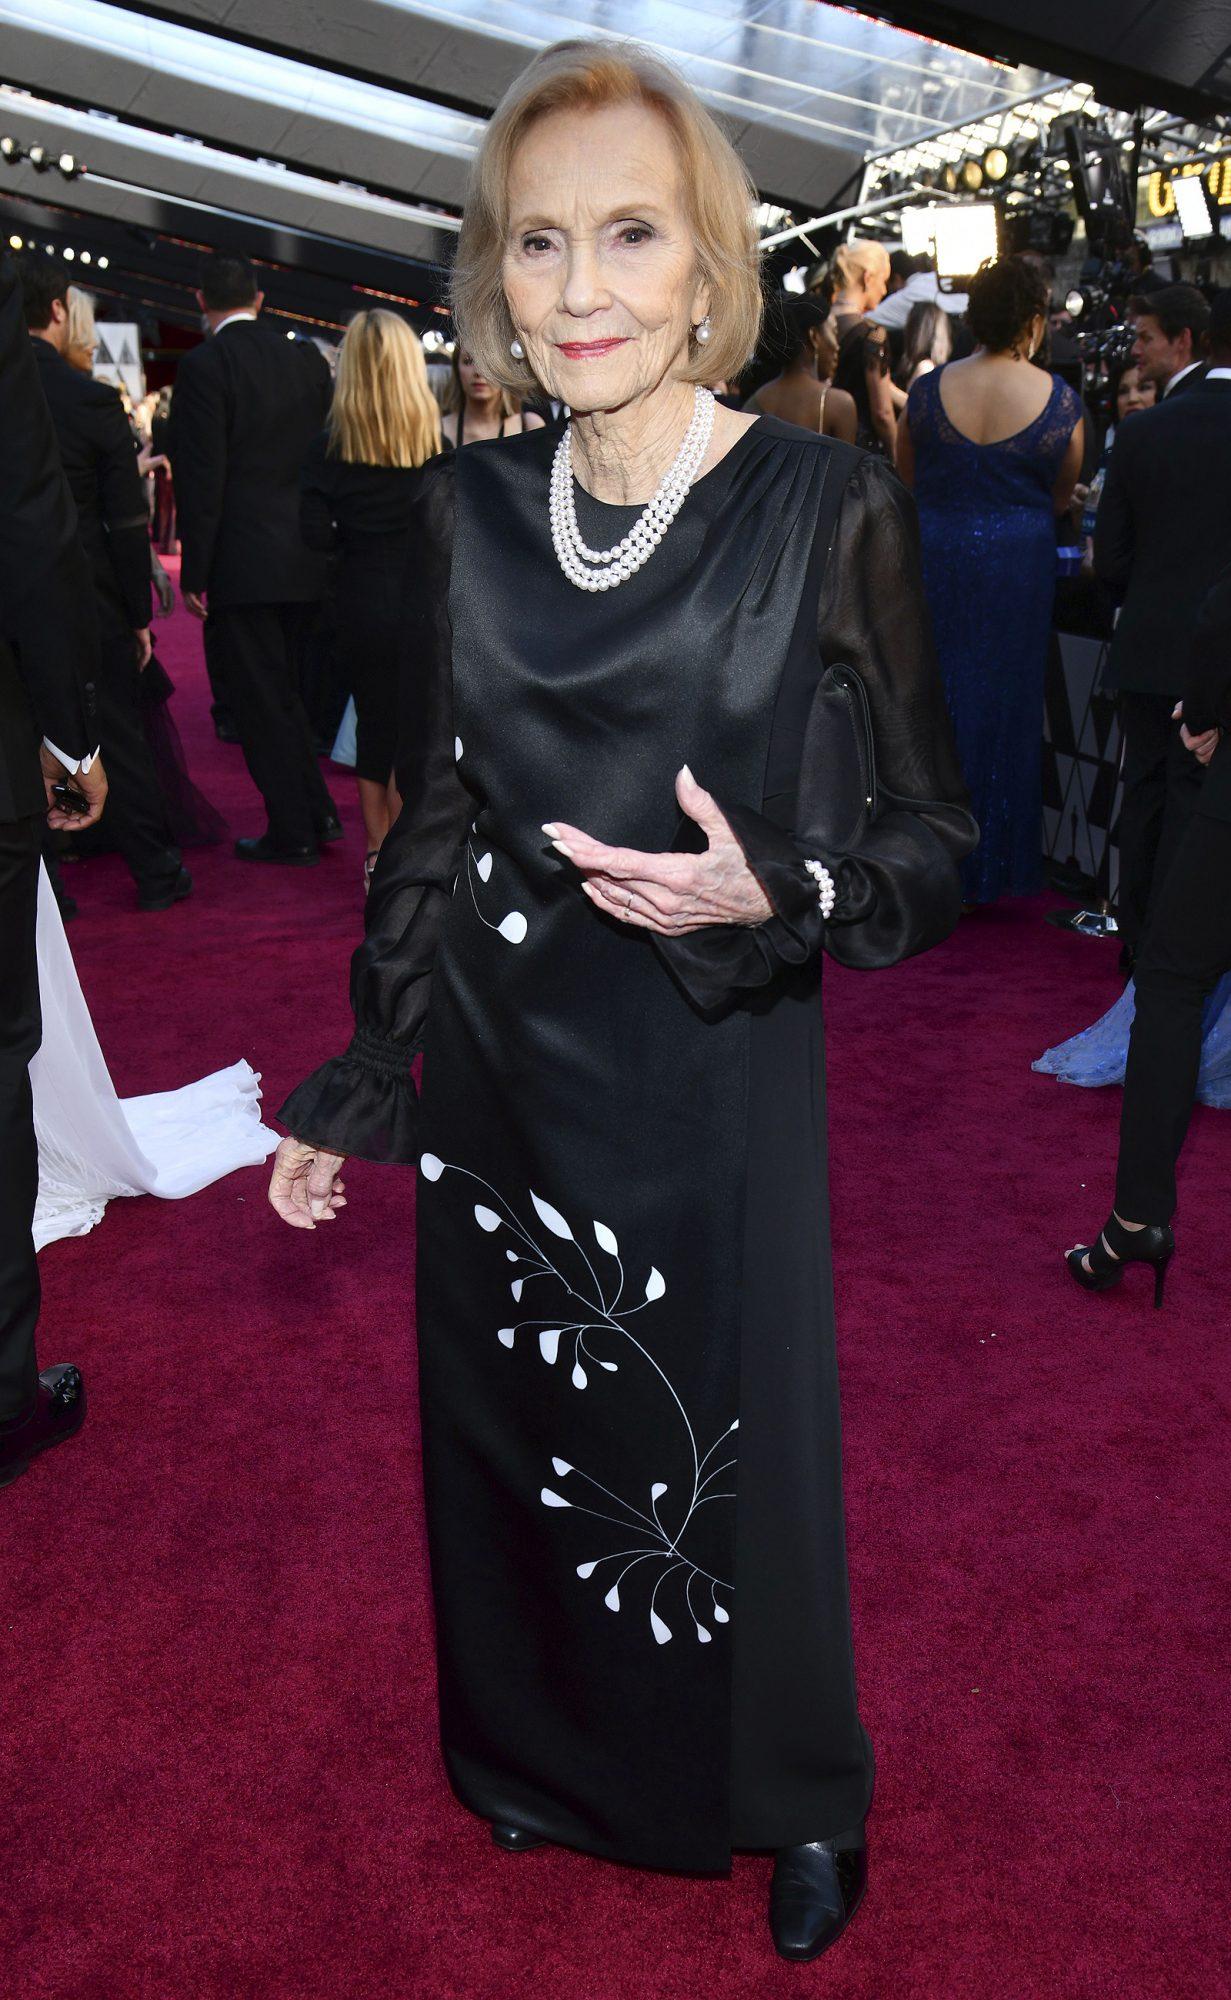 90th Academy Awards - Red Carpet, Los Angeles, USA - 04 Mar 2018